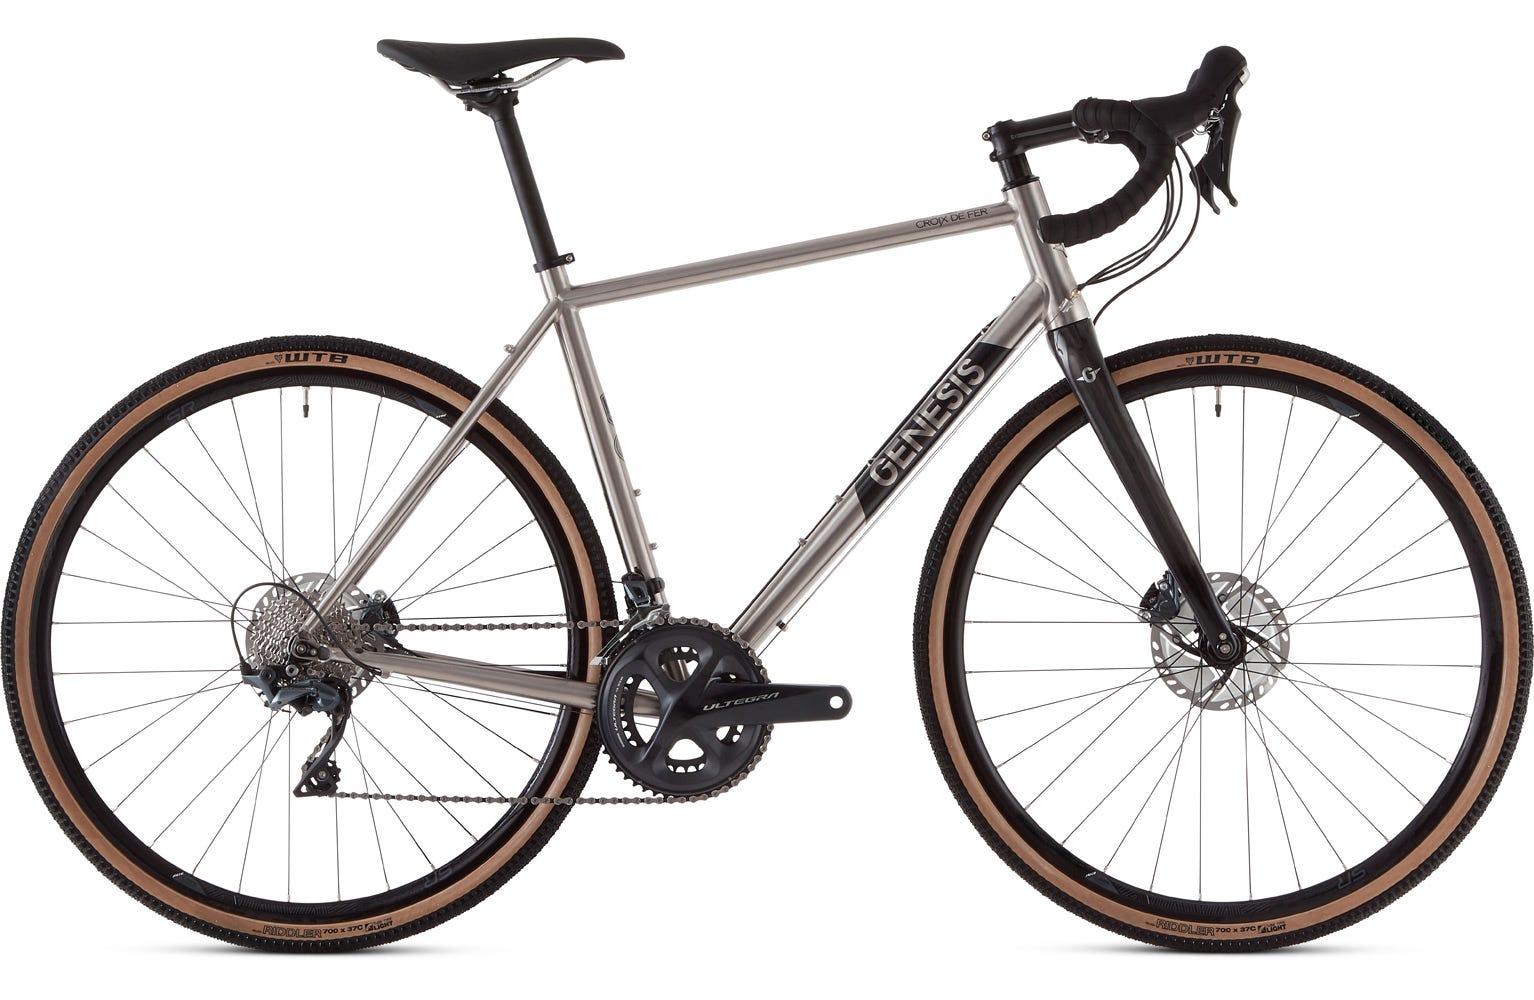 Genesis 2019 Croix de Fer Ti xl Bike sample (unused)